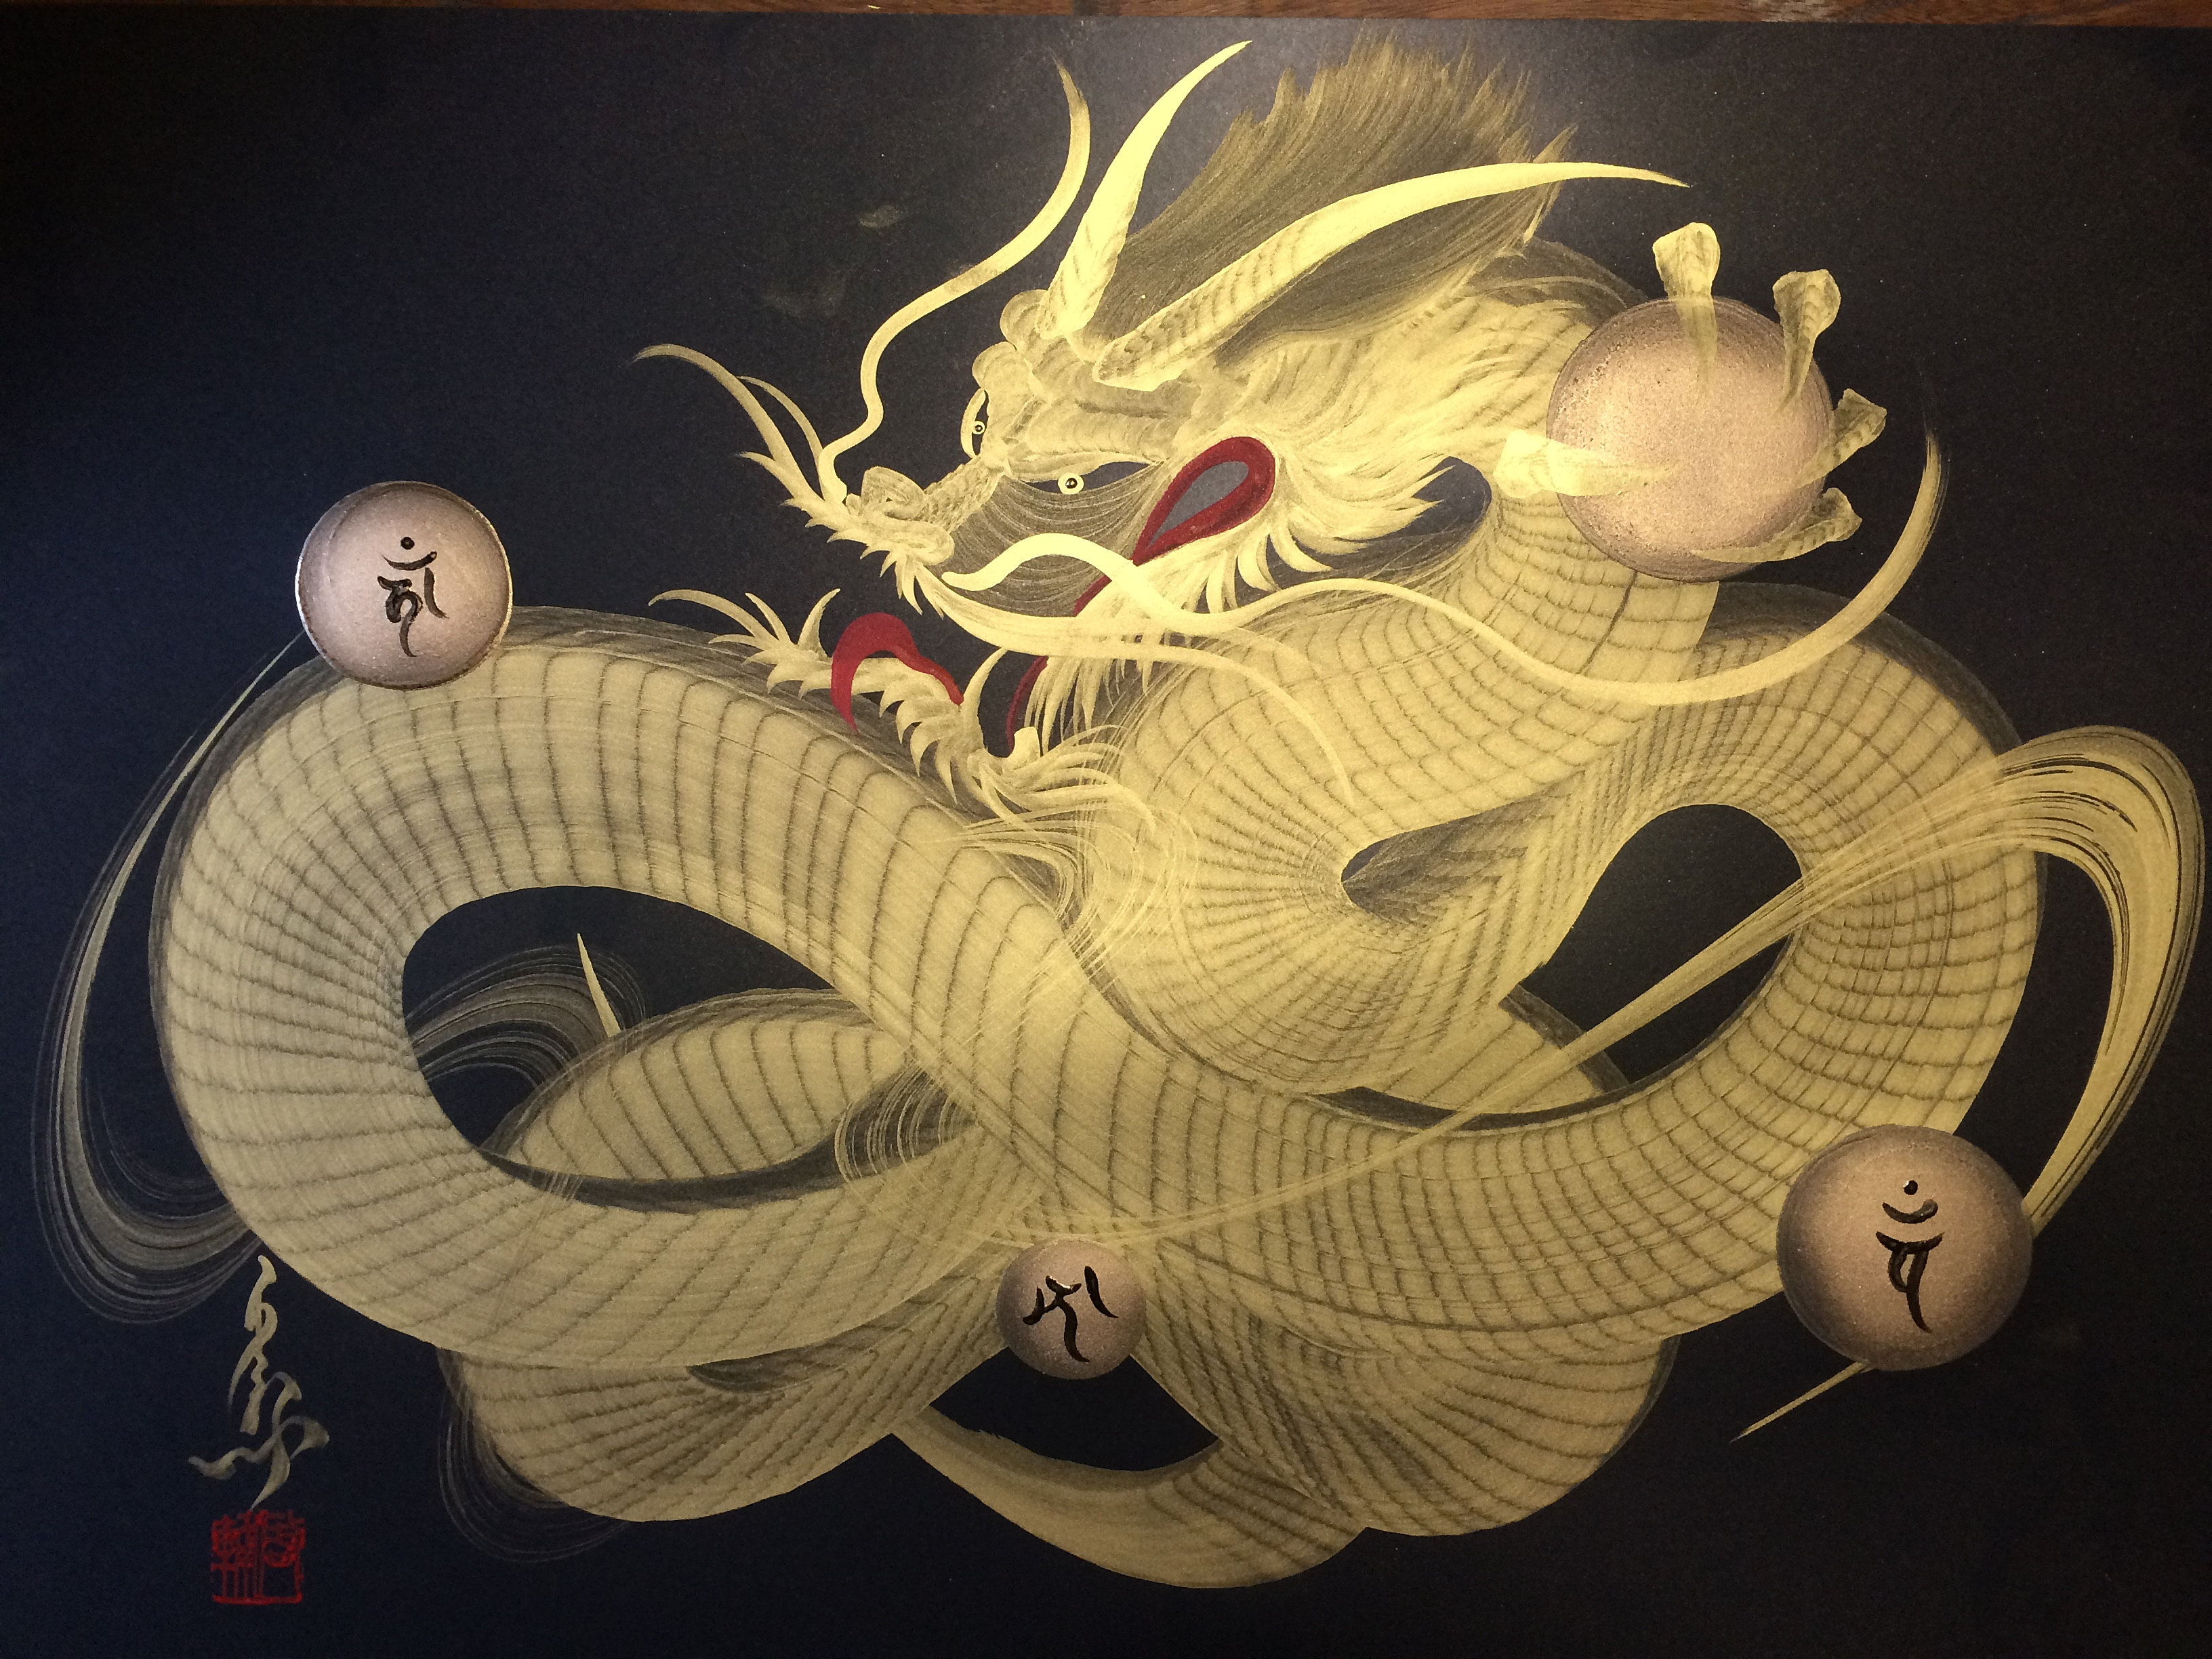 ĺ�都一筆龍 ĸ�筆龍絵師 Ɖ�島啓輔 Ť�龍